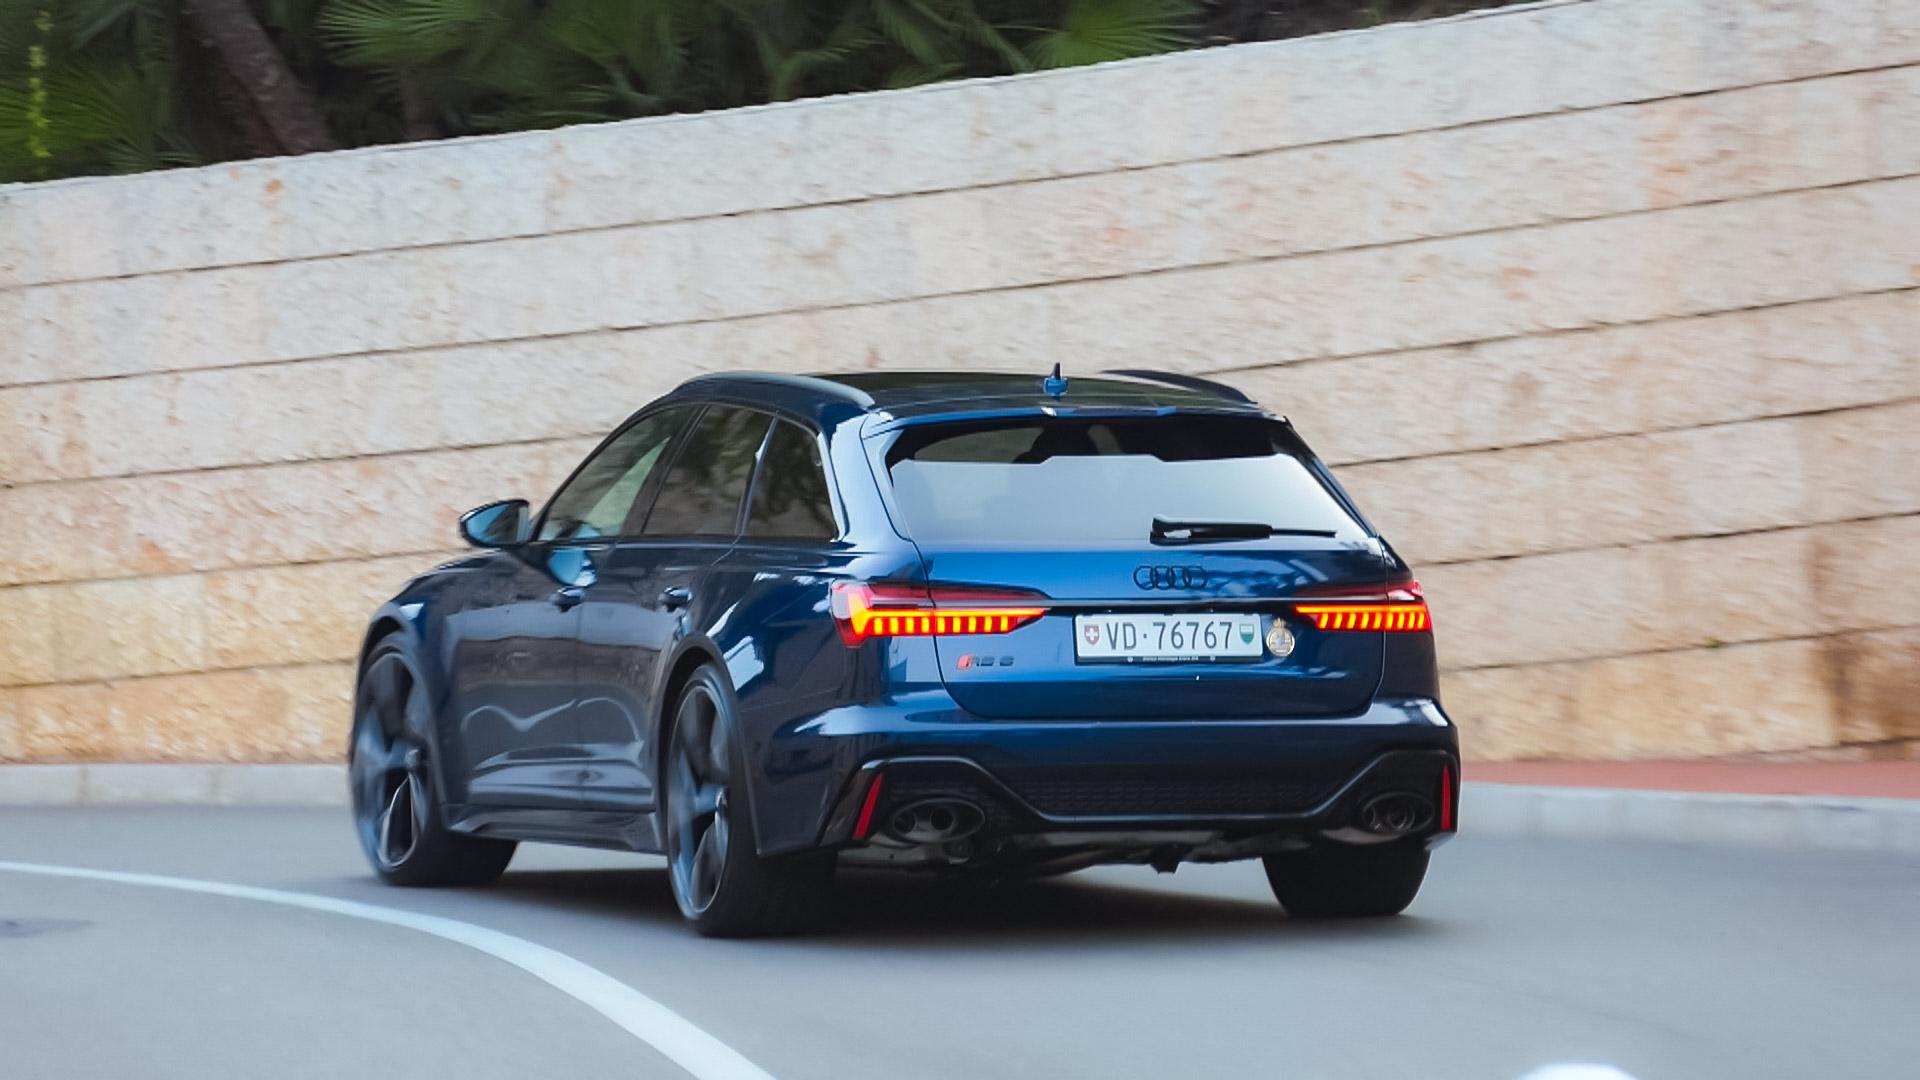 Audi RS6 - VD-76767 (CH)